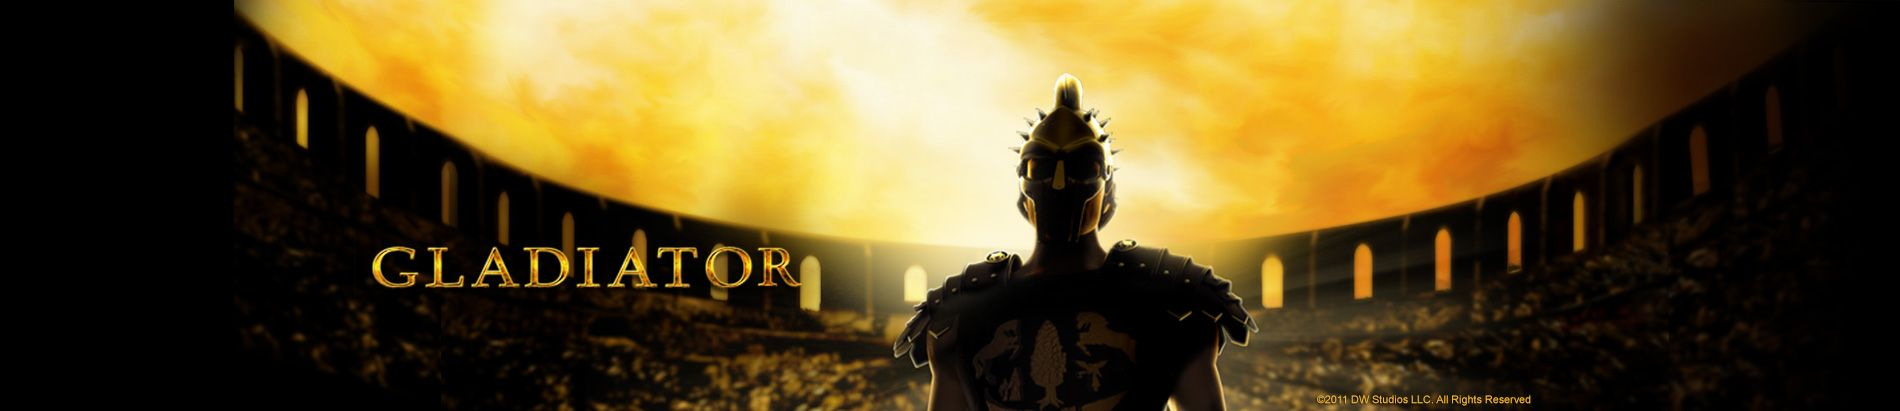 netbet vegas gladiator jackpot